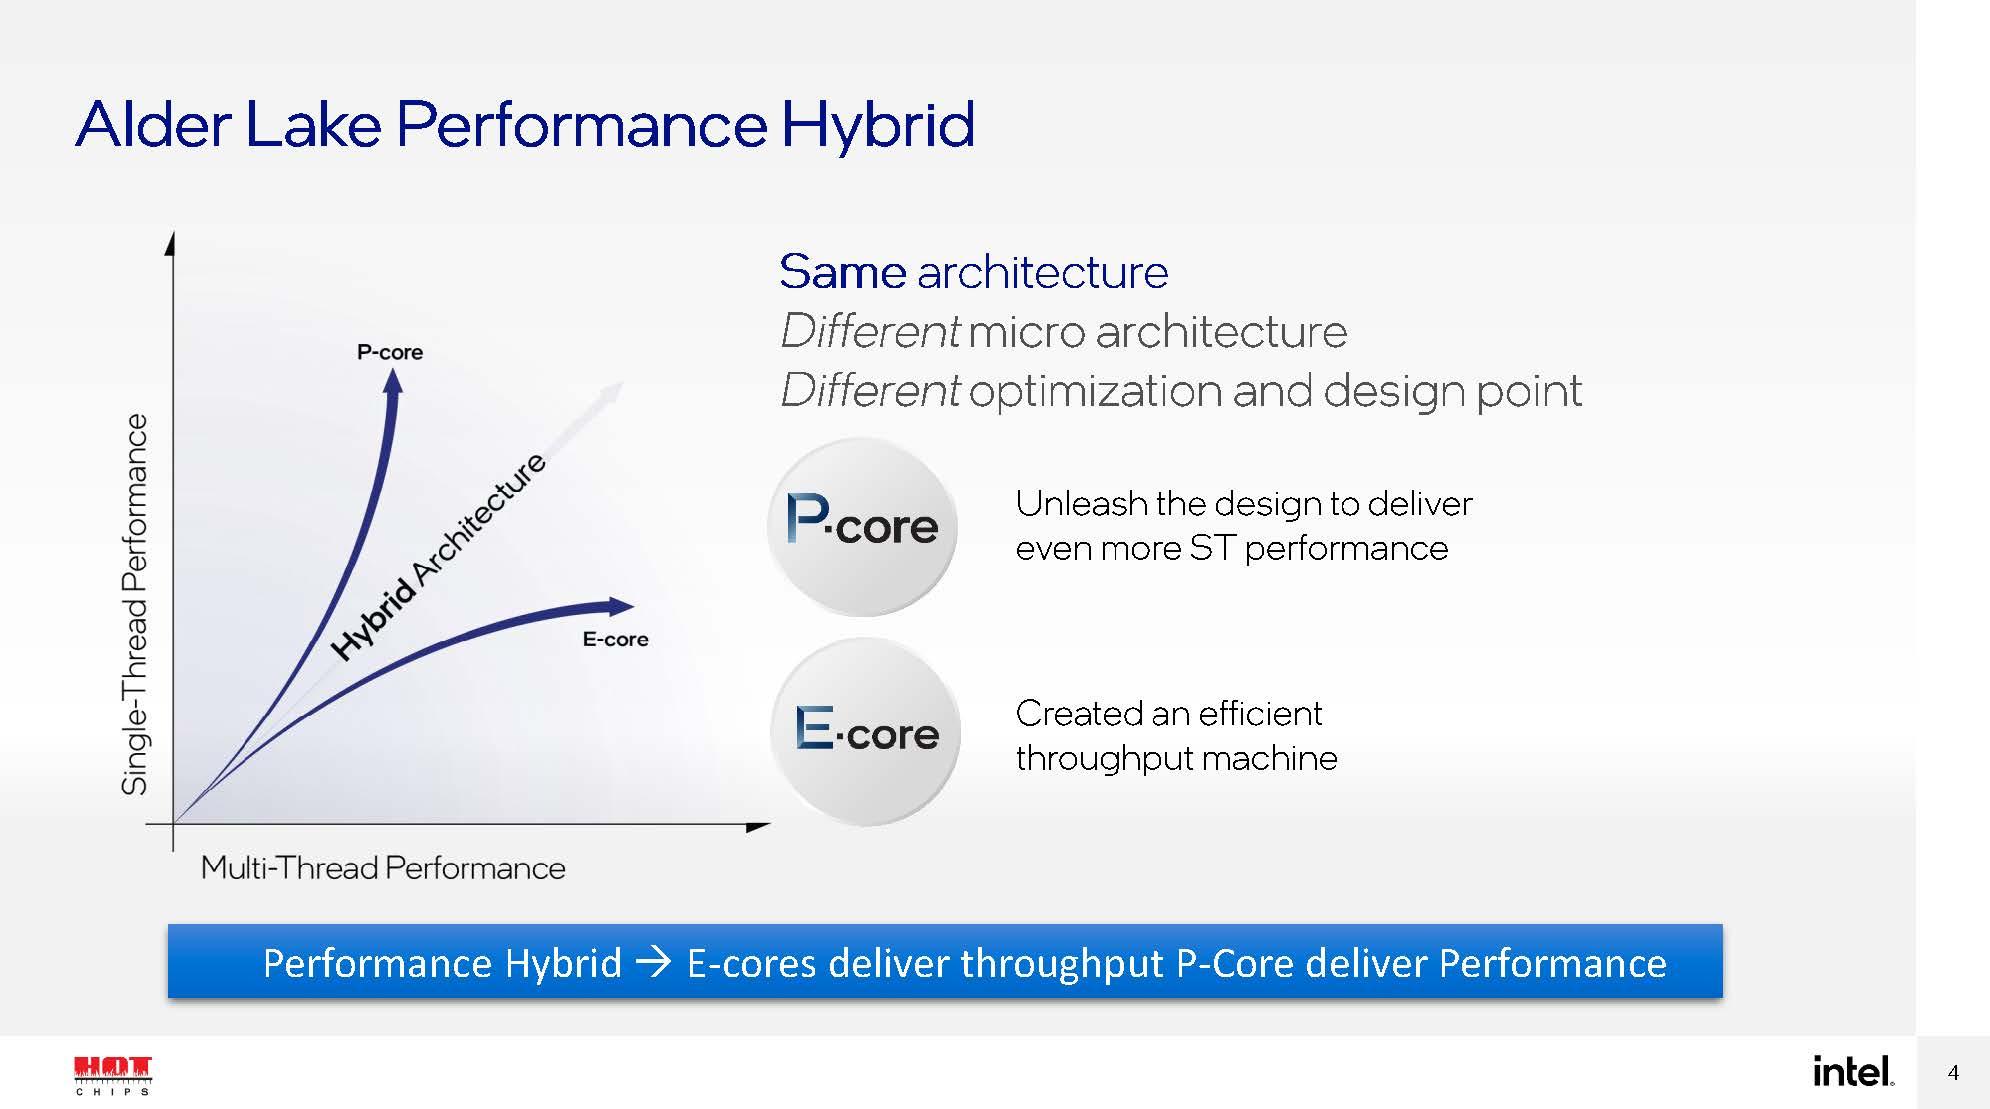 HC33 Intel Alder Lake Performance Hybrid 2